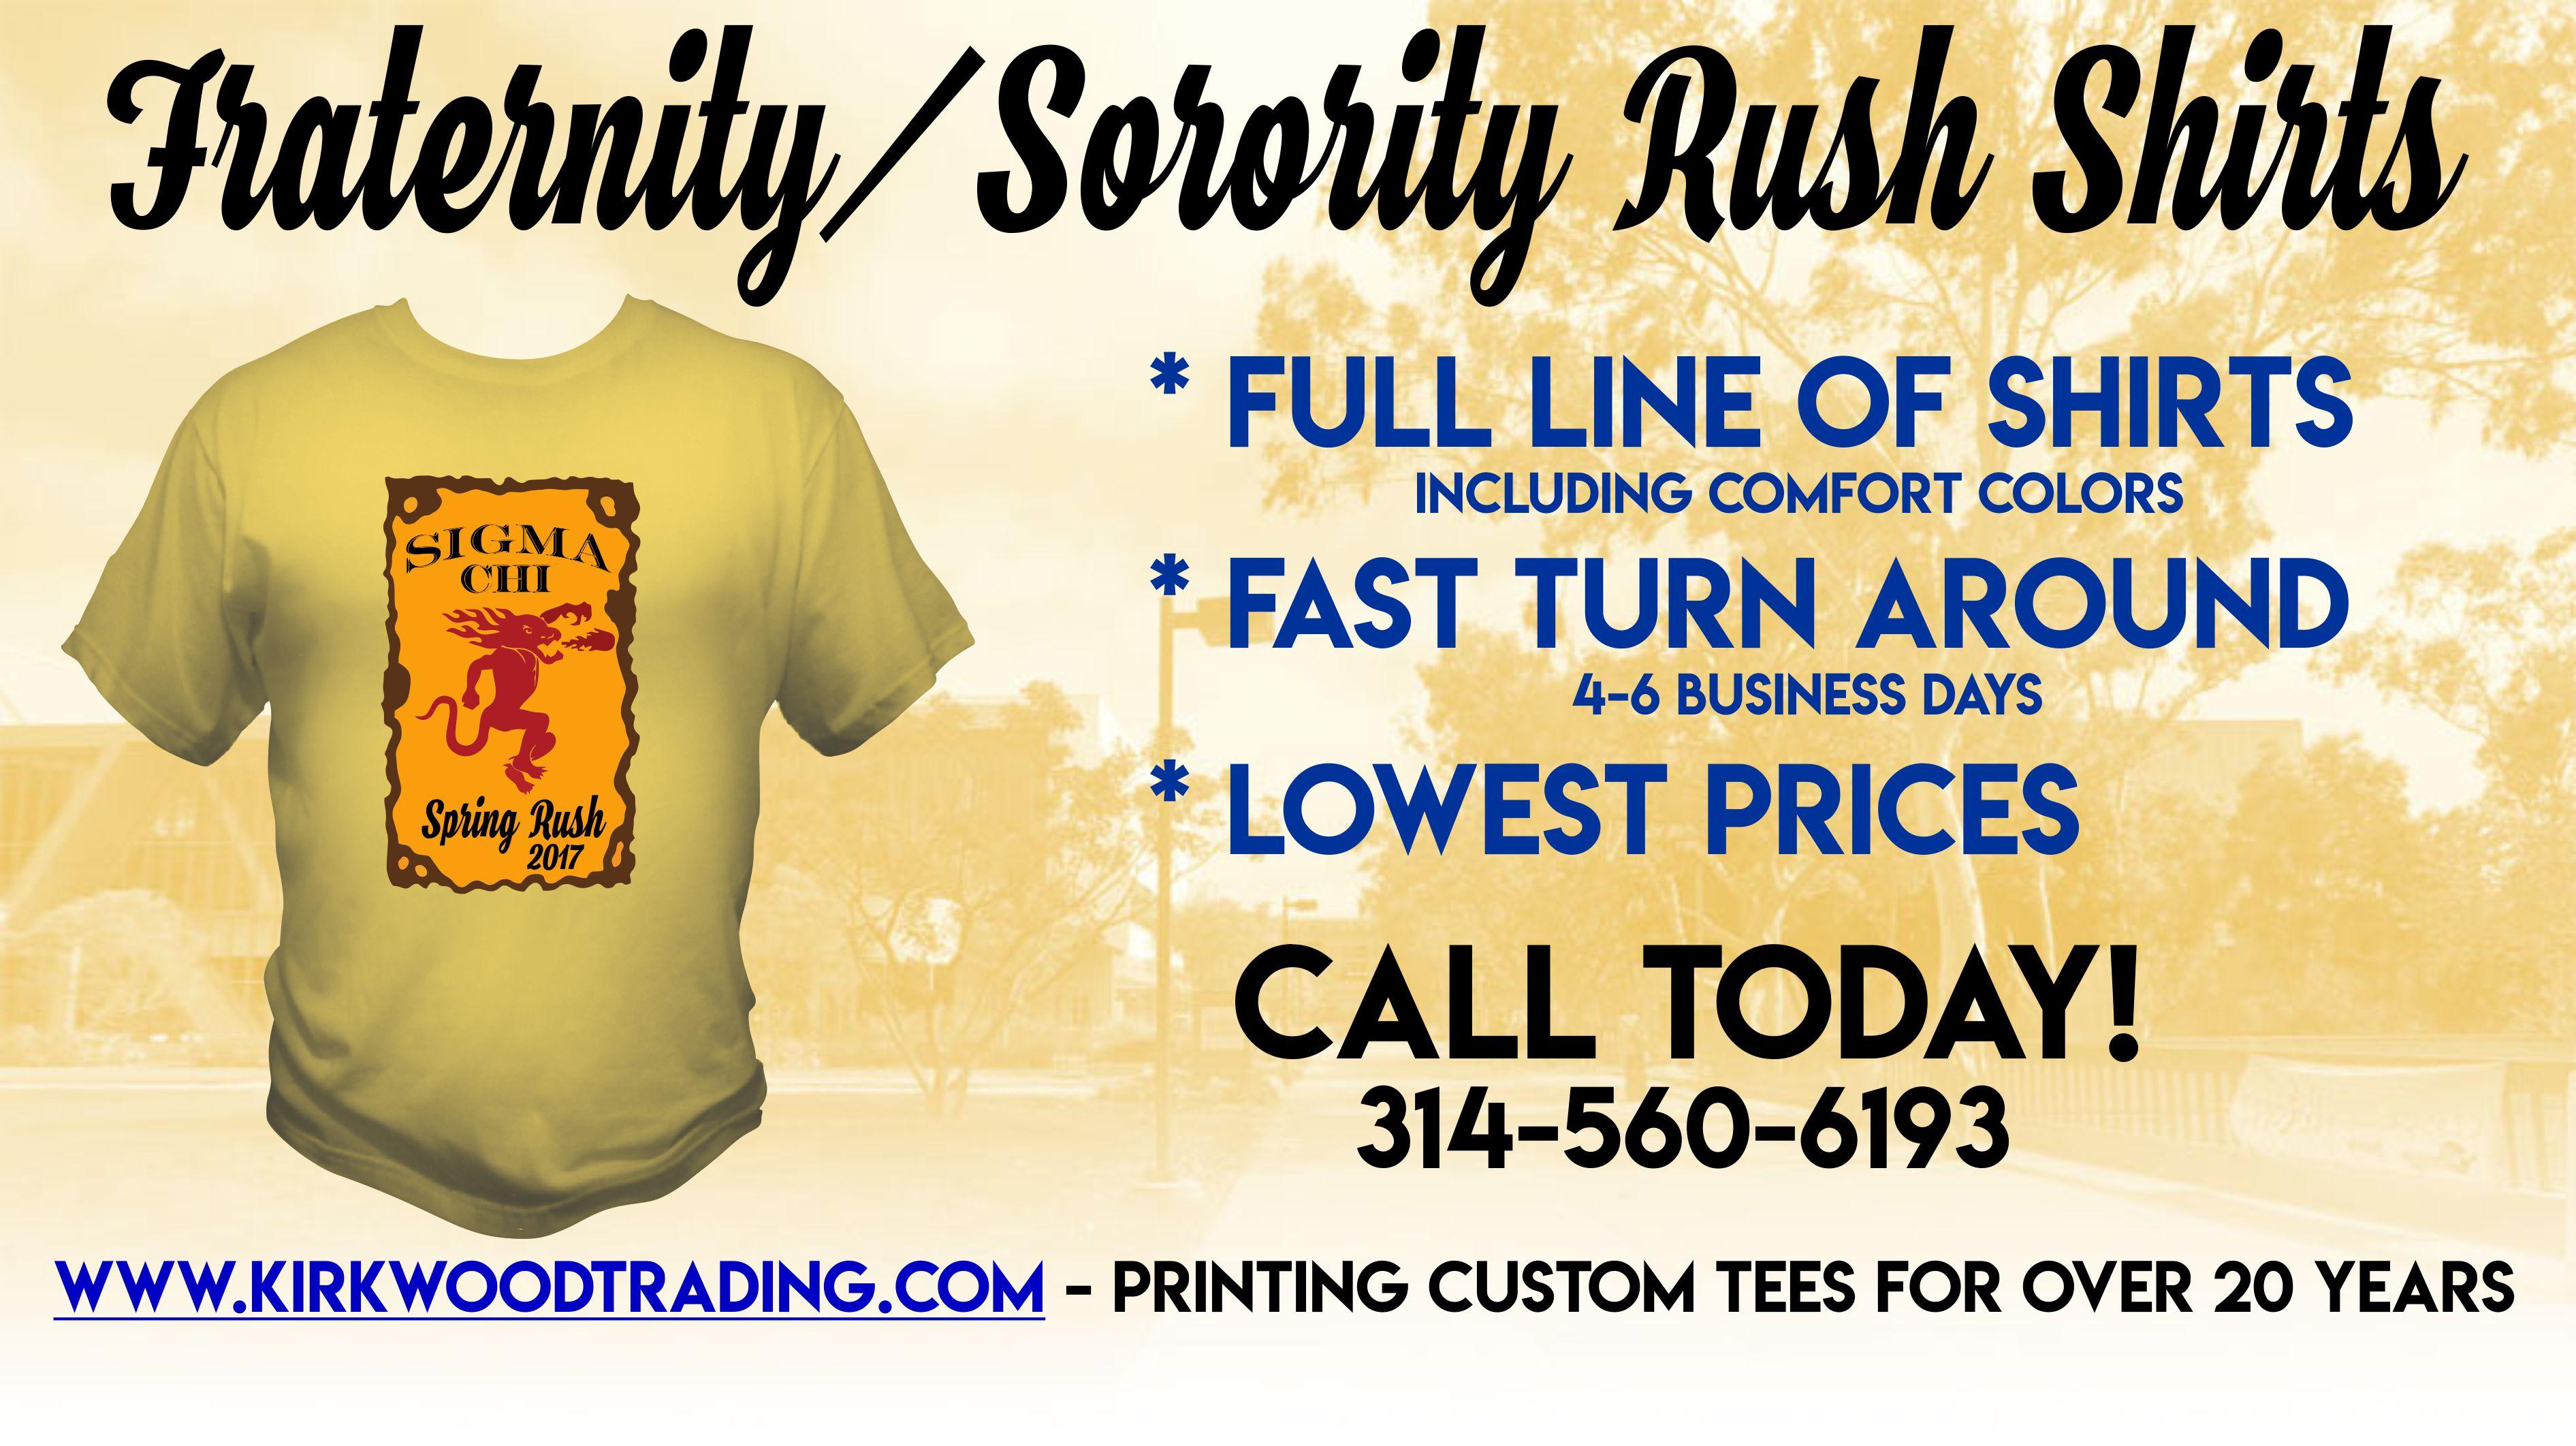 Fraternity Sorority Custom Rush Shirts